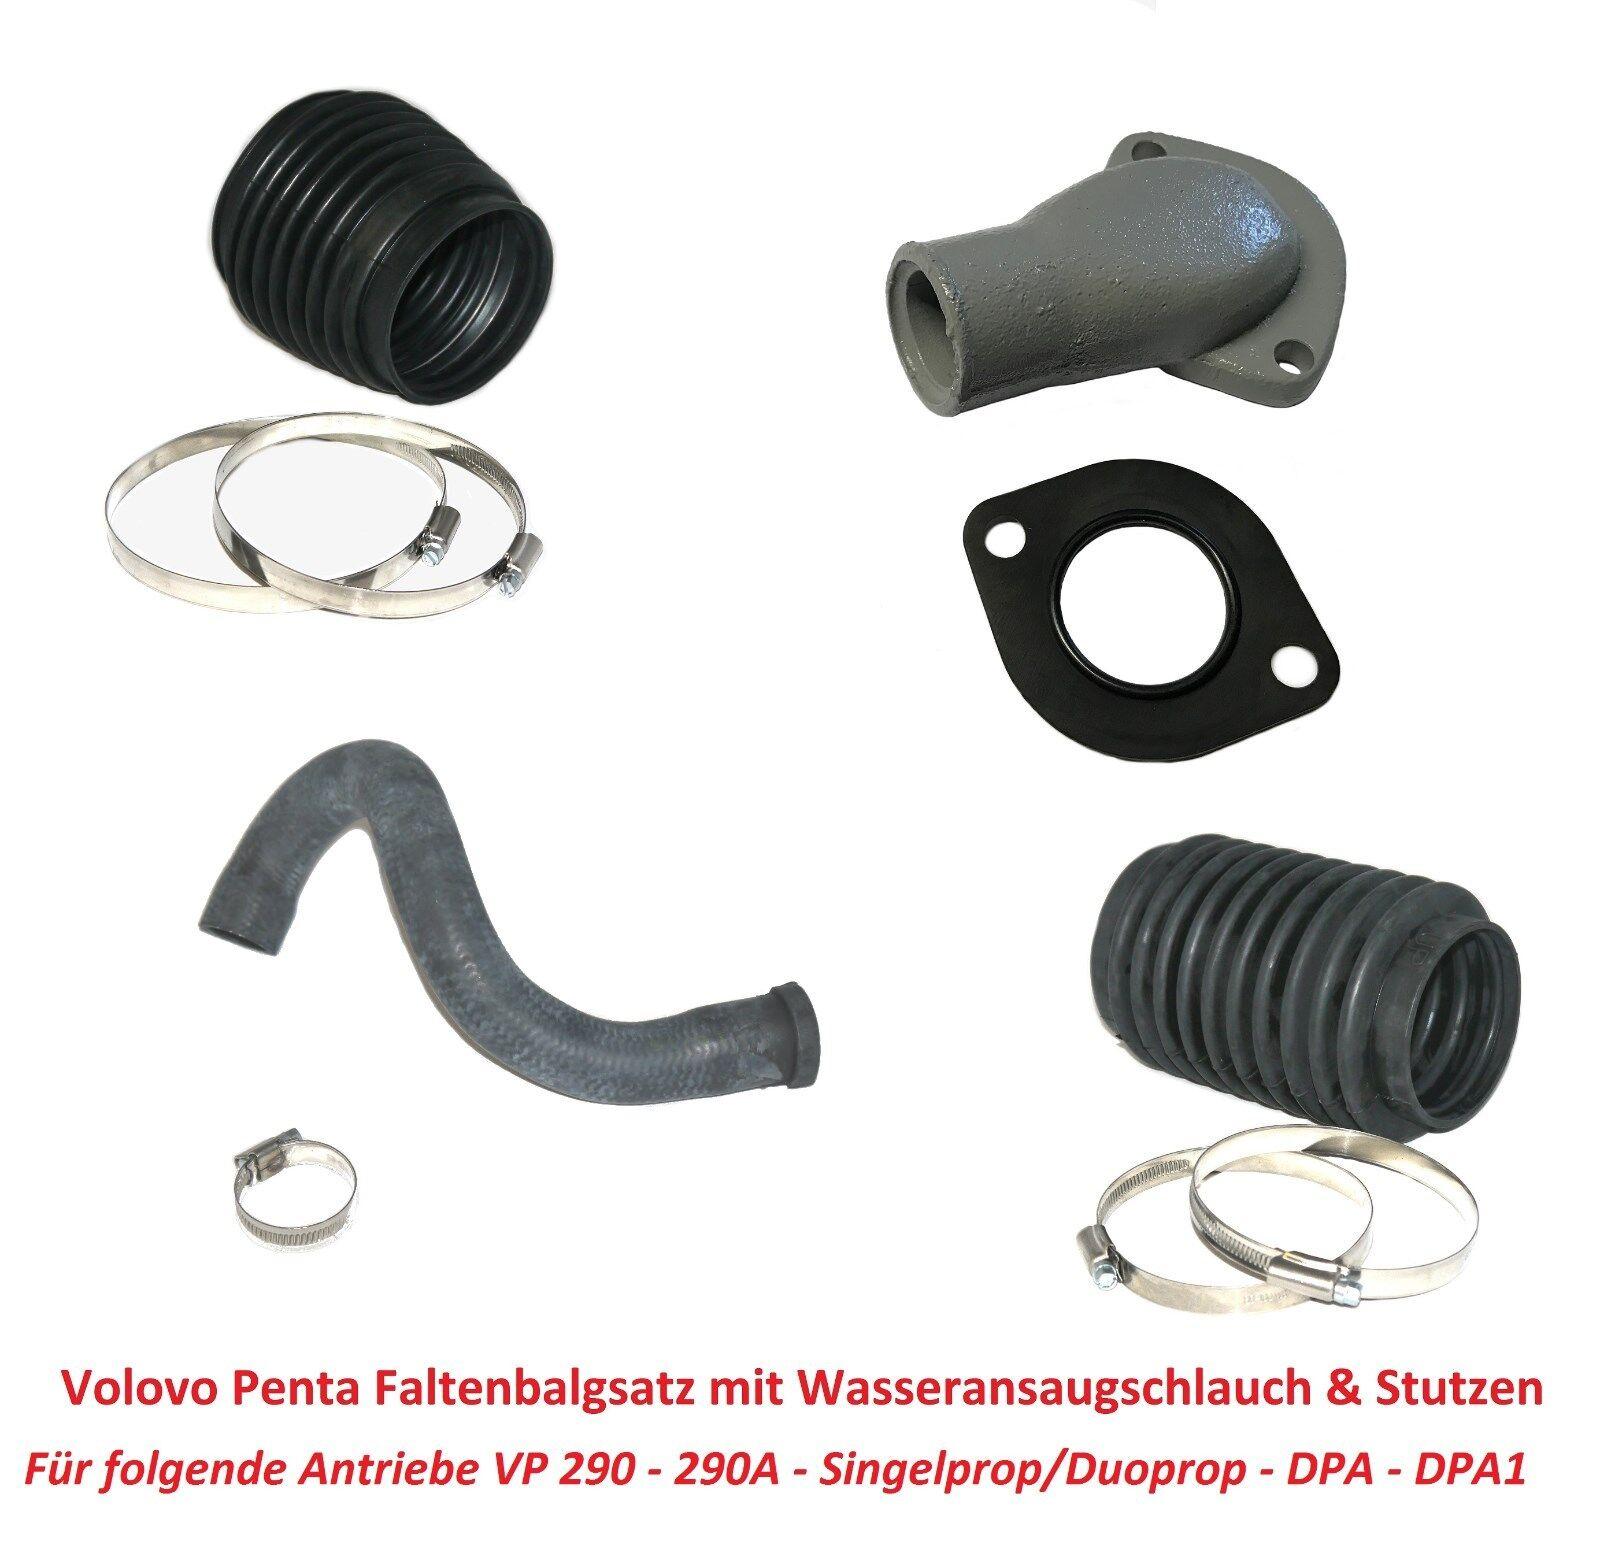 Faltenbalg Set Volvo Penta Antrieb 290 290A DP SP DPA DPA1 Z-Antrieb Sterndrive